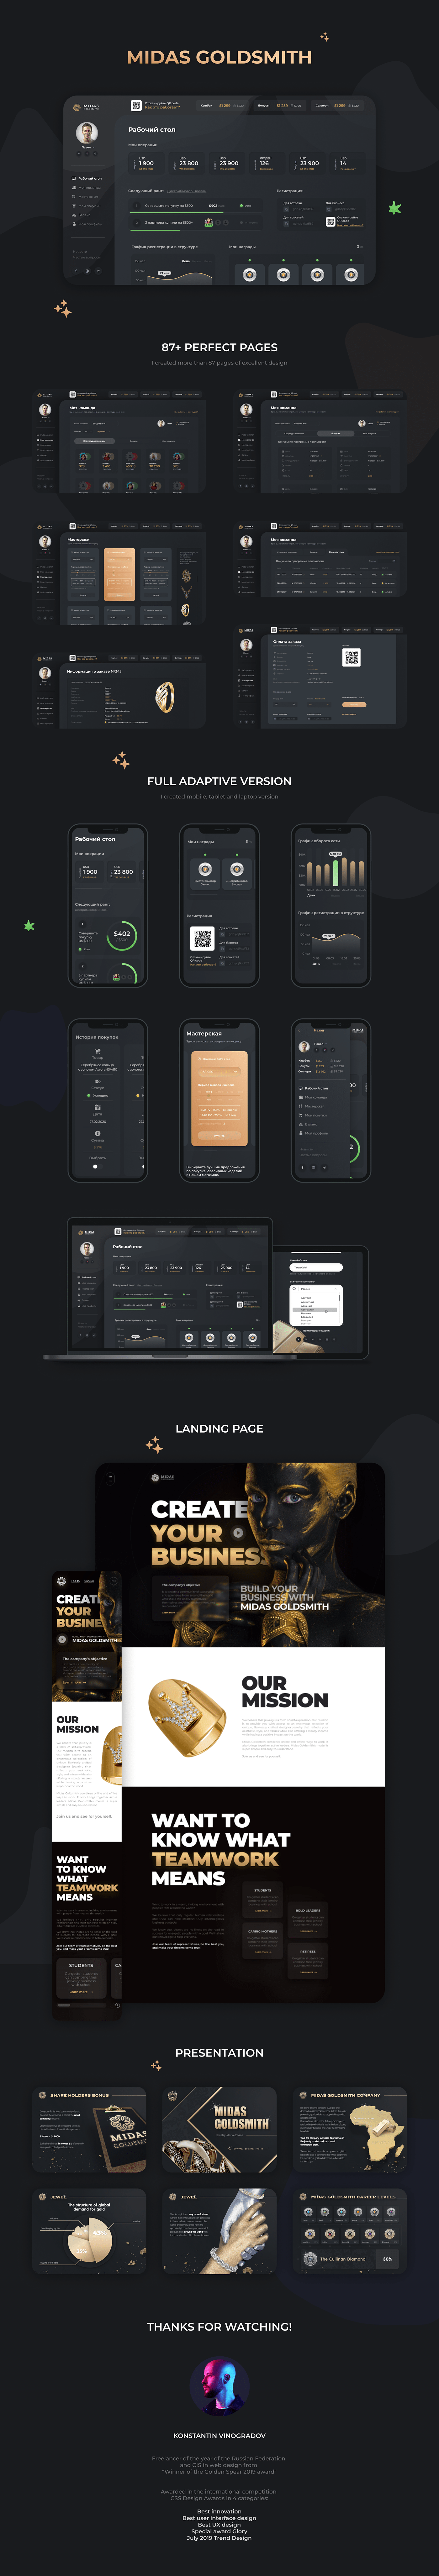 Crypto design finance financial platform Fintech girl gold golden landing page UI UX design Web Design